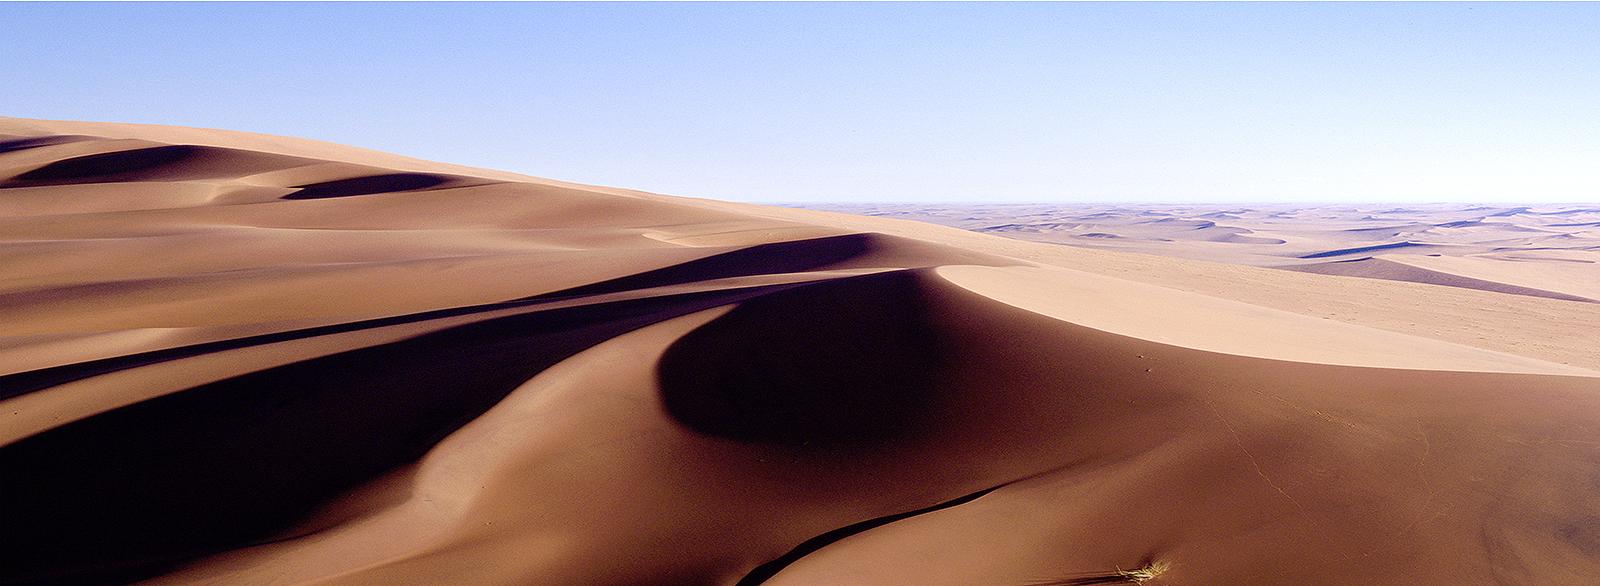 Namibia_druck.jpg